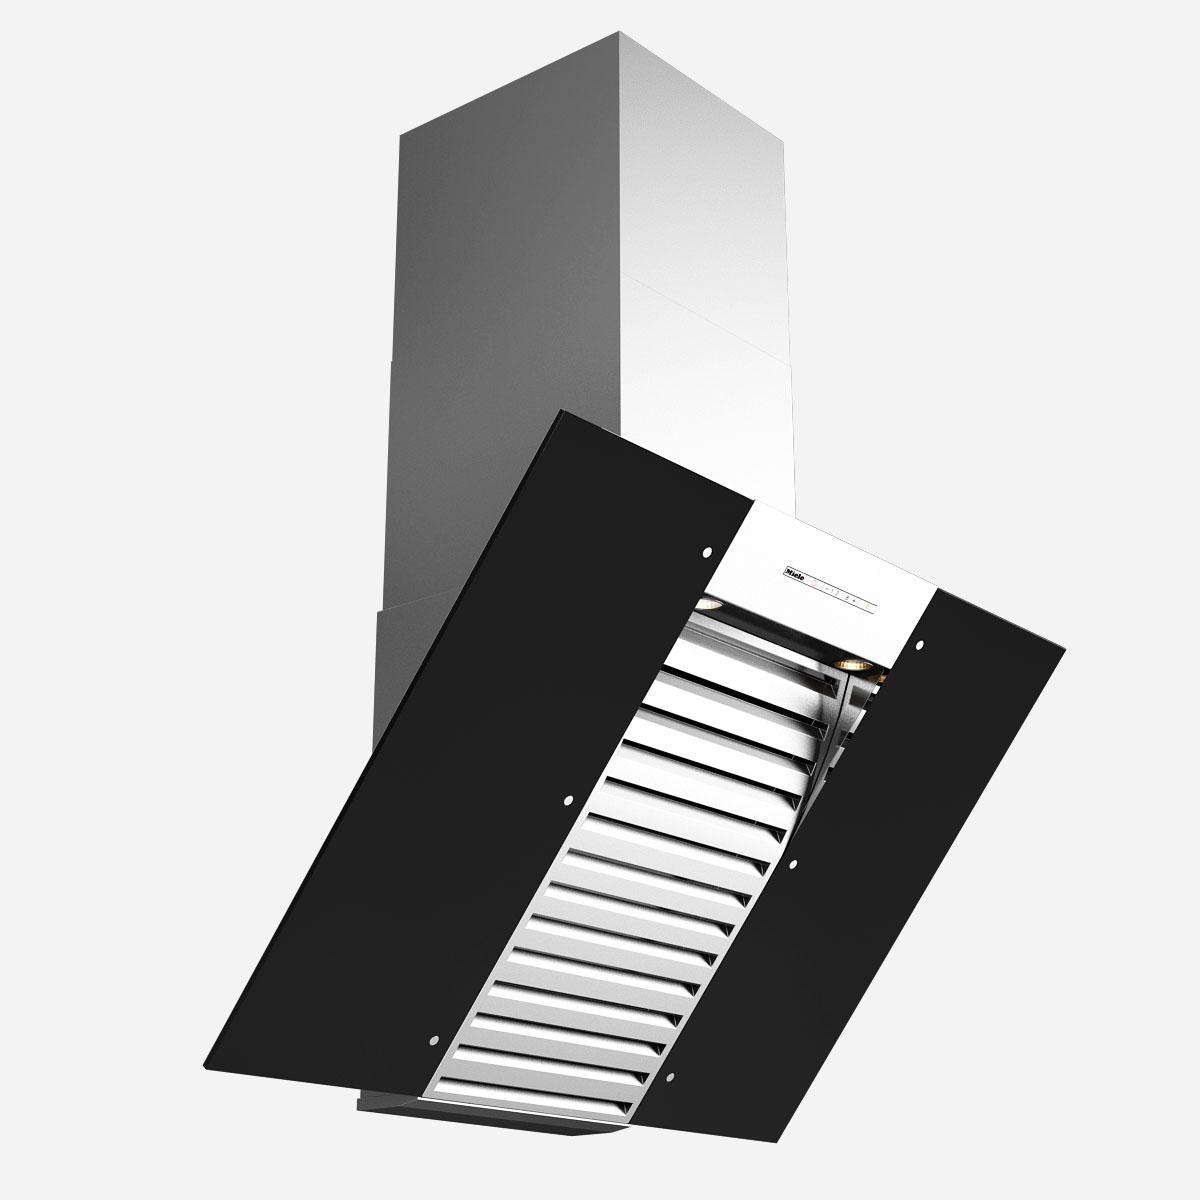 miele da 6096 wing kitchen hood by genkot29 3docean. Black Bedroom Furniture Sets. Home Design Ideas